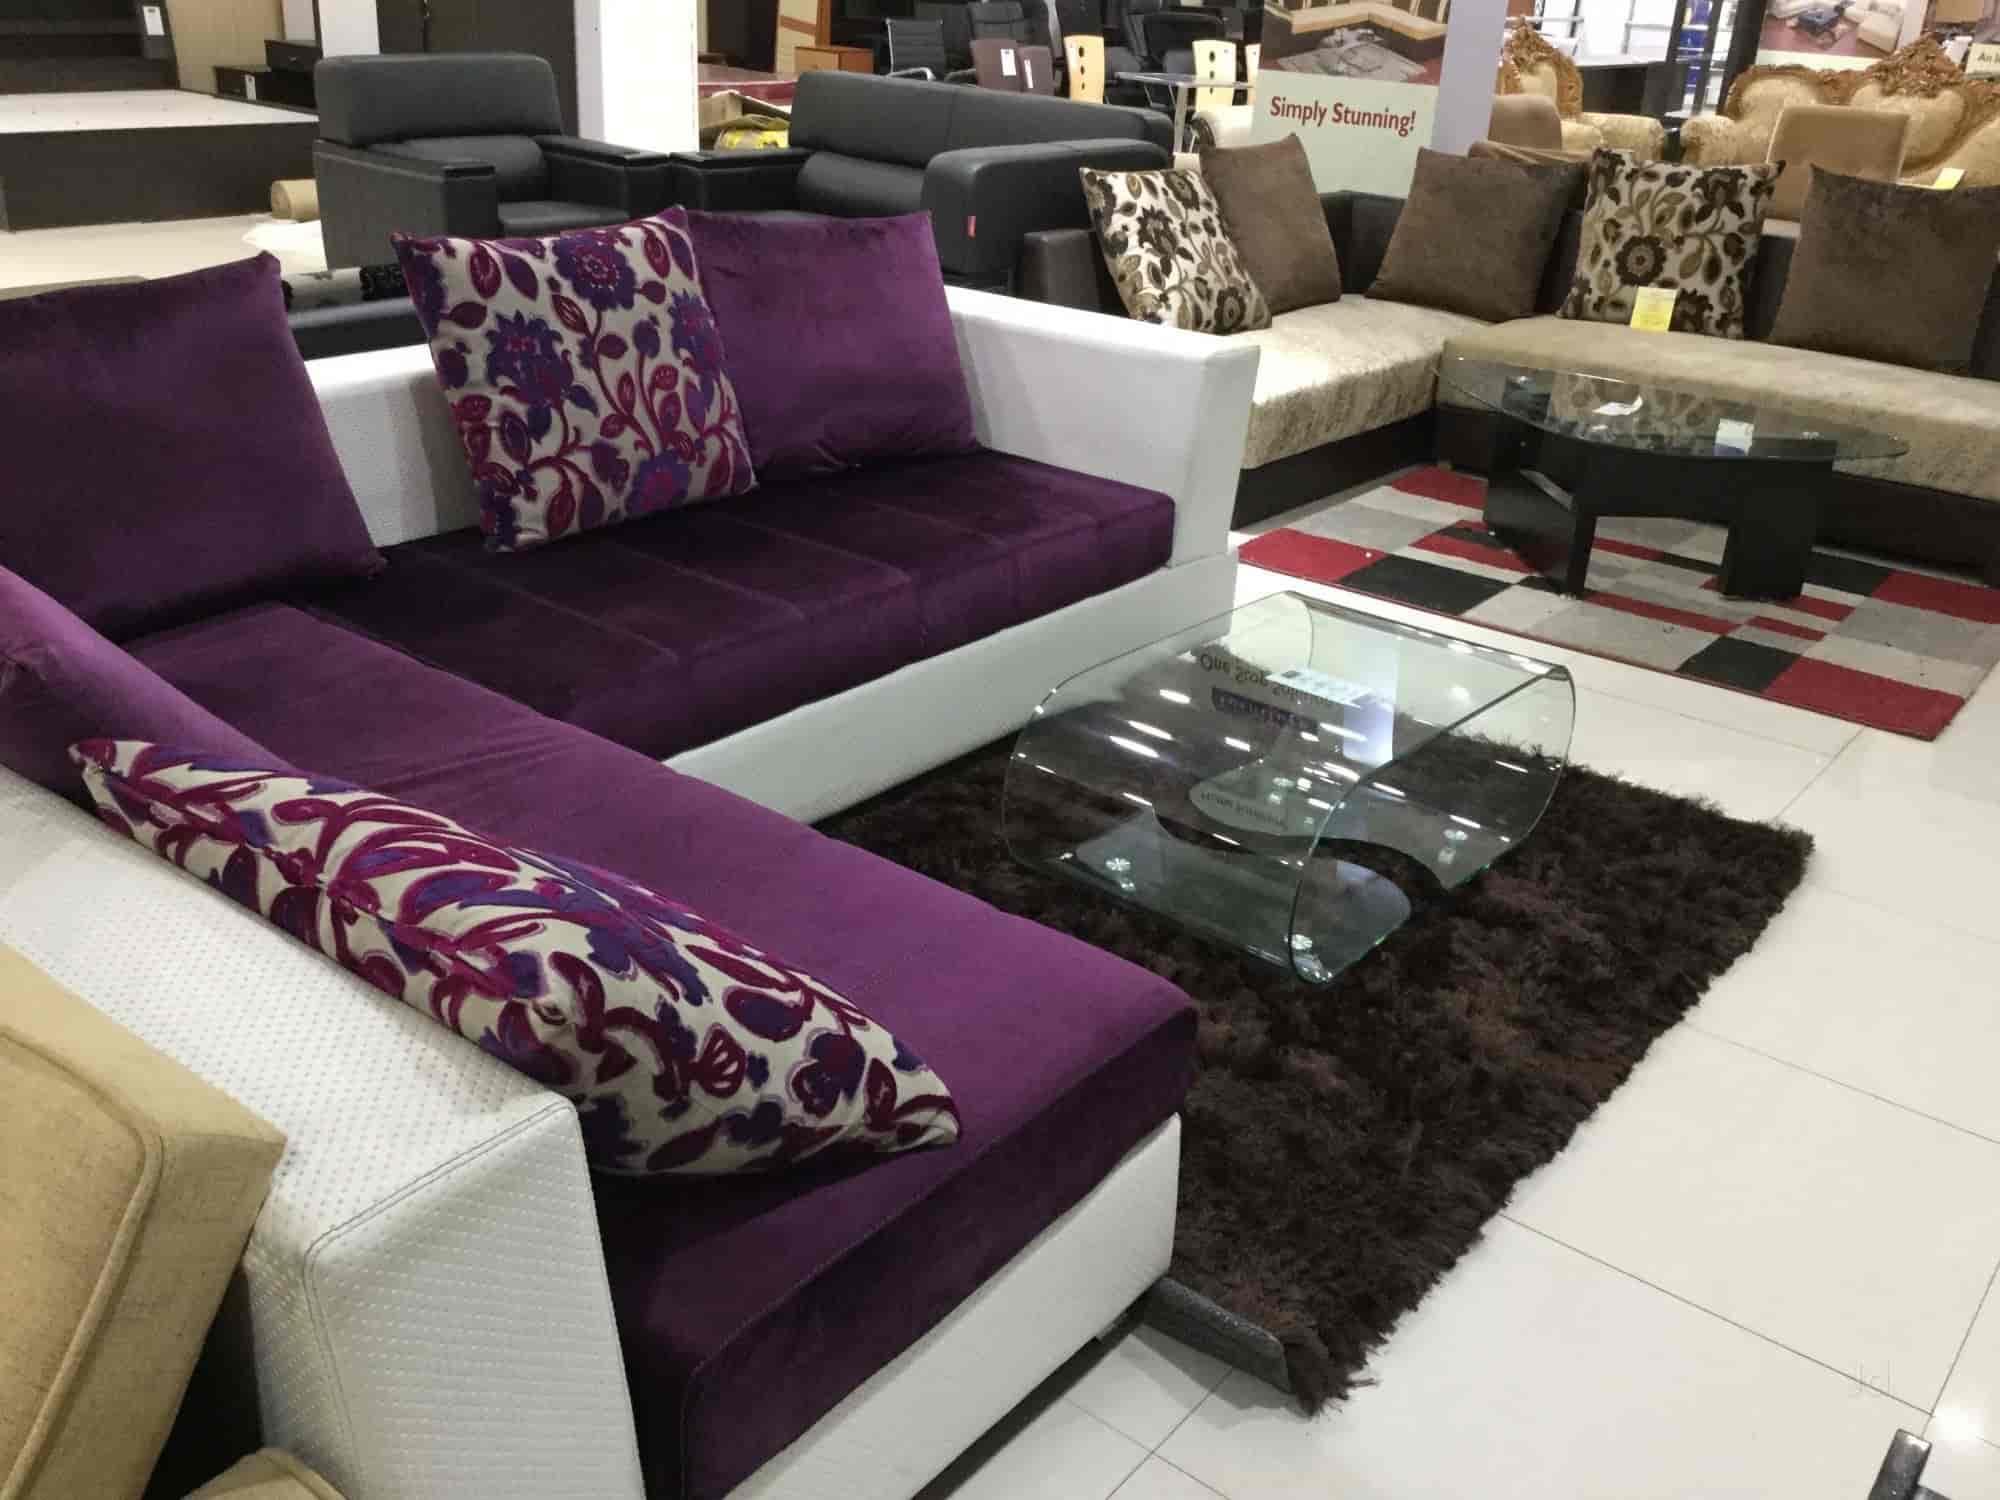 inside view of furniture shop mobel furniture photos berhampore murshidabad furniture dealers